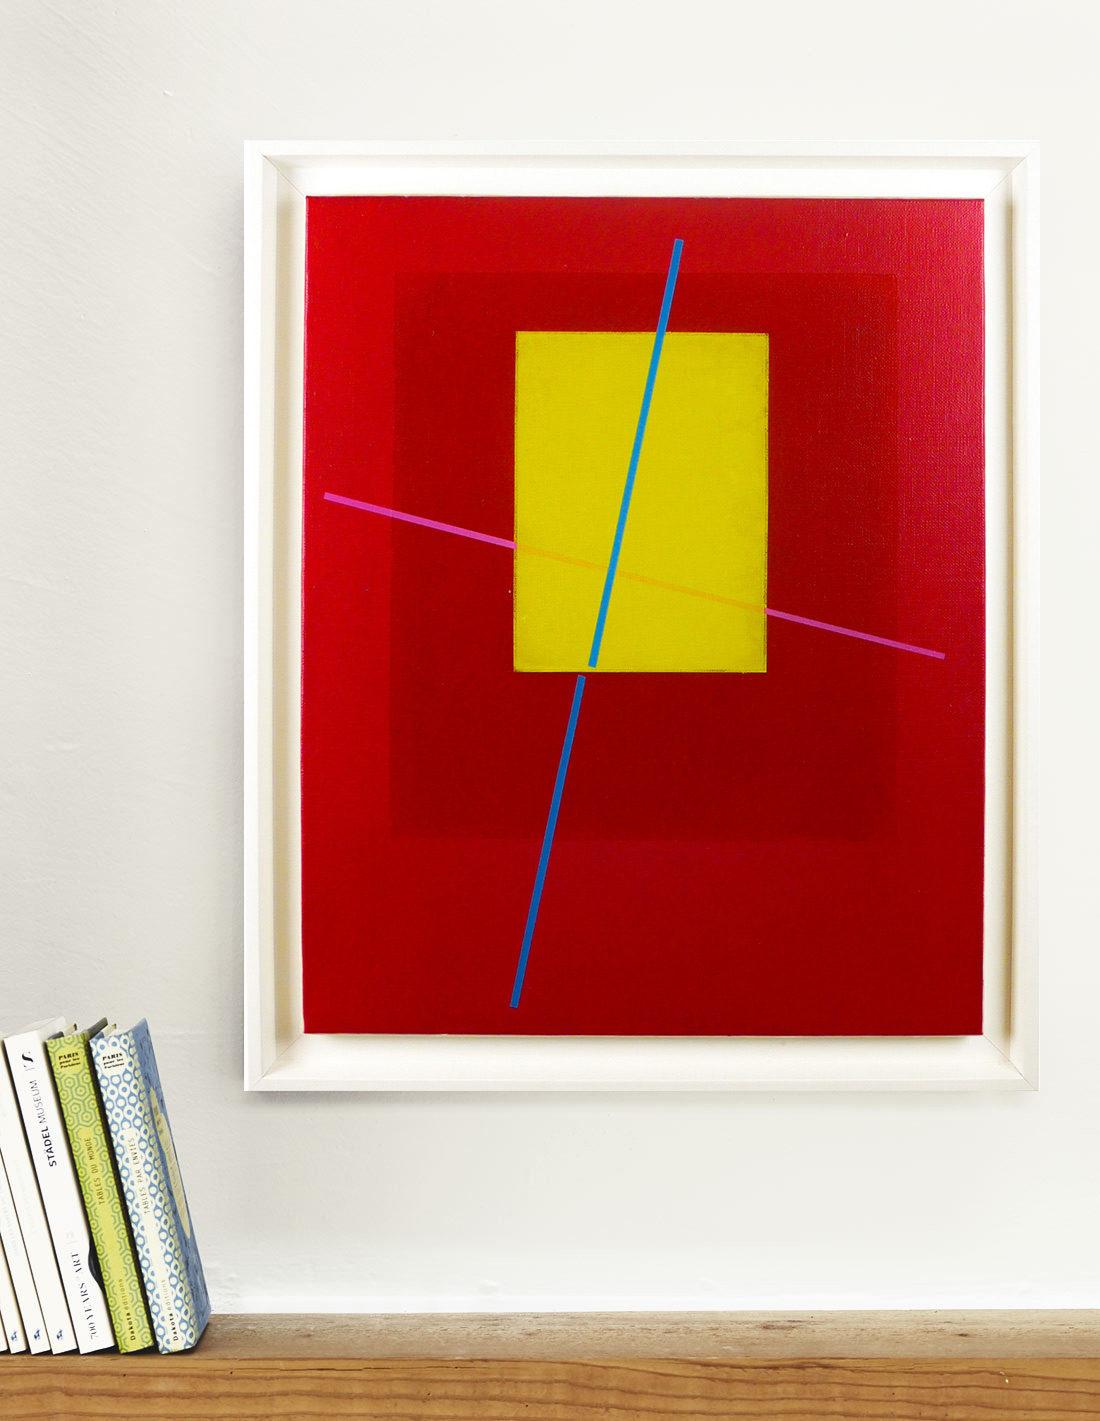 Carlos Stoffel, Peinture, Rose et rectangle j